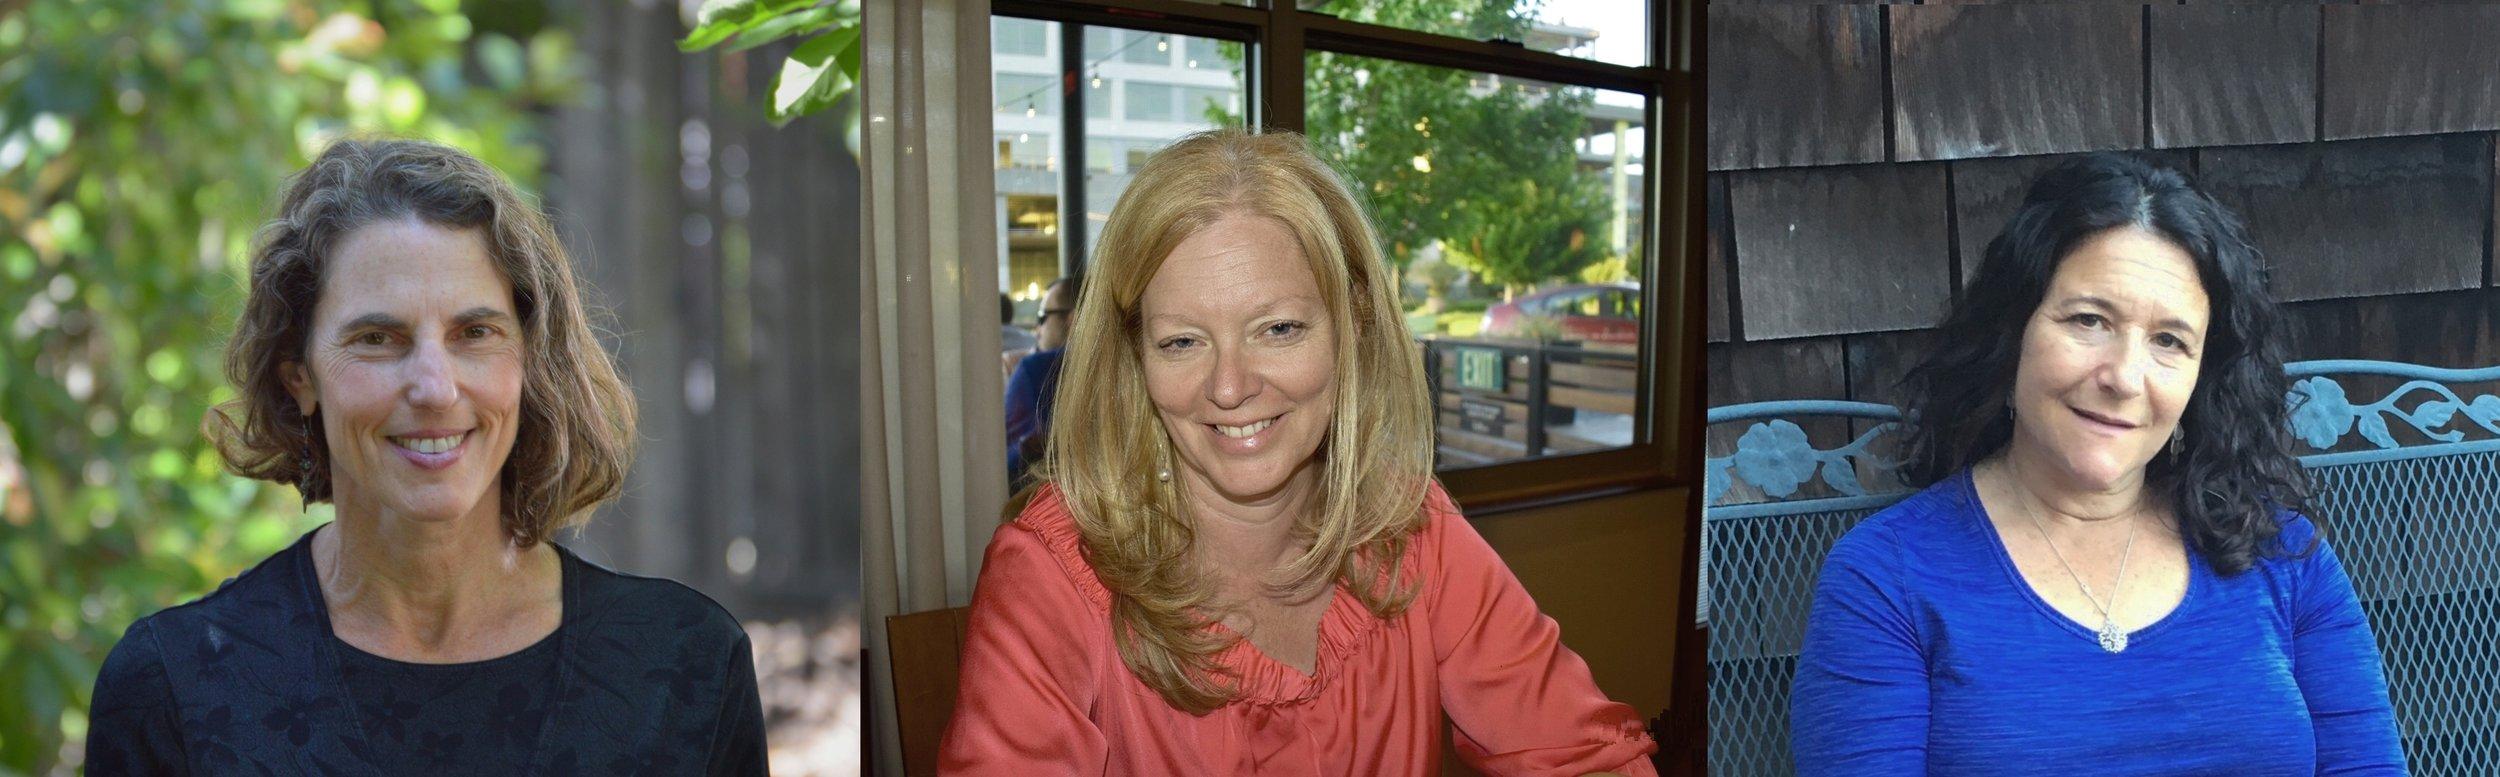 Peninsula Birth Companions - Audrey KalmanJulie DubrouilletEva Roodman650-303-2405Serving San Jose to San Francisco